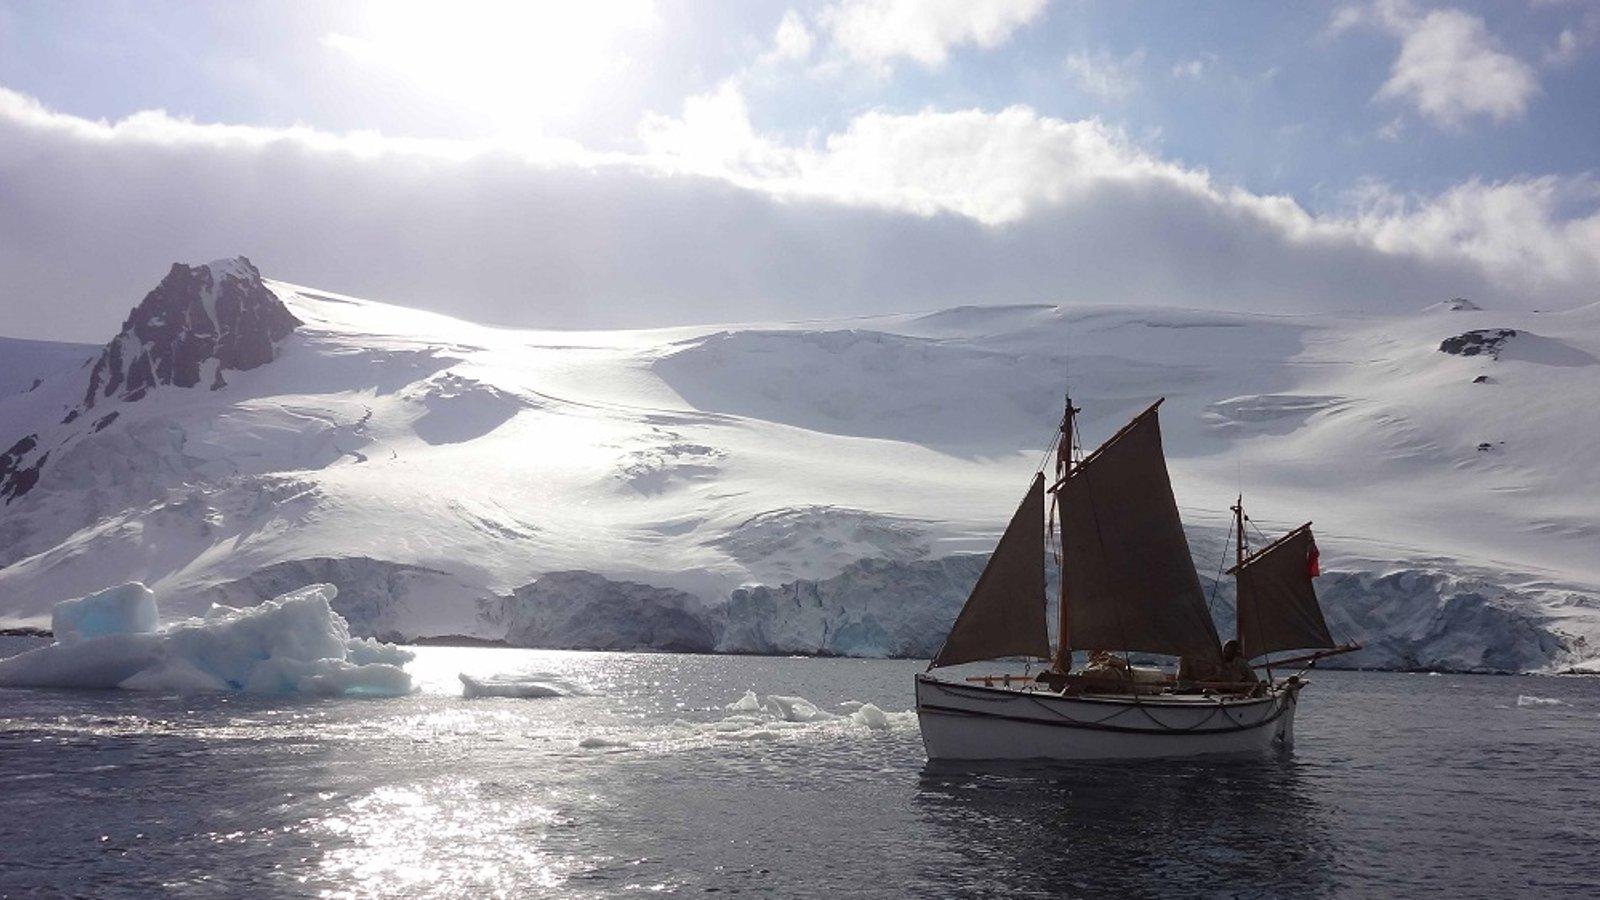 Chasing Shackleton - Episode 1